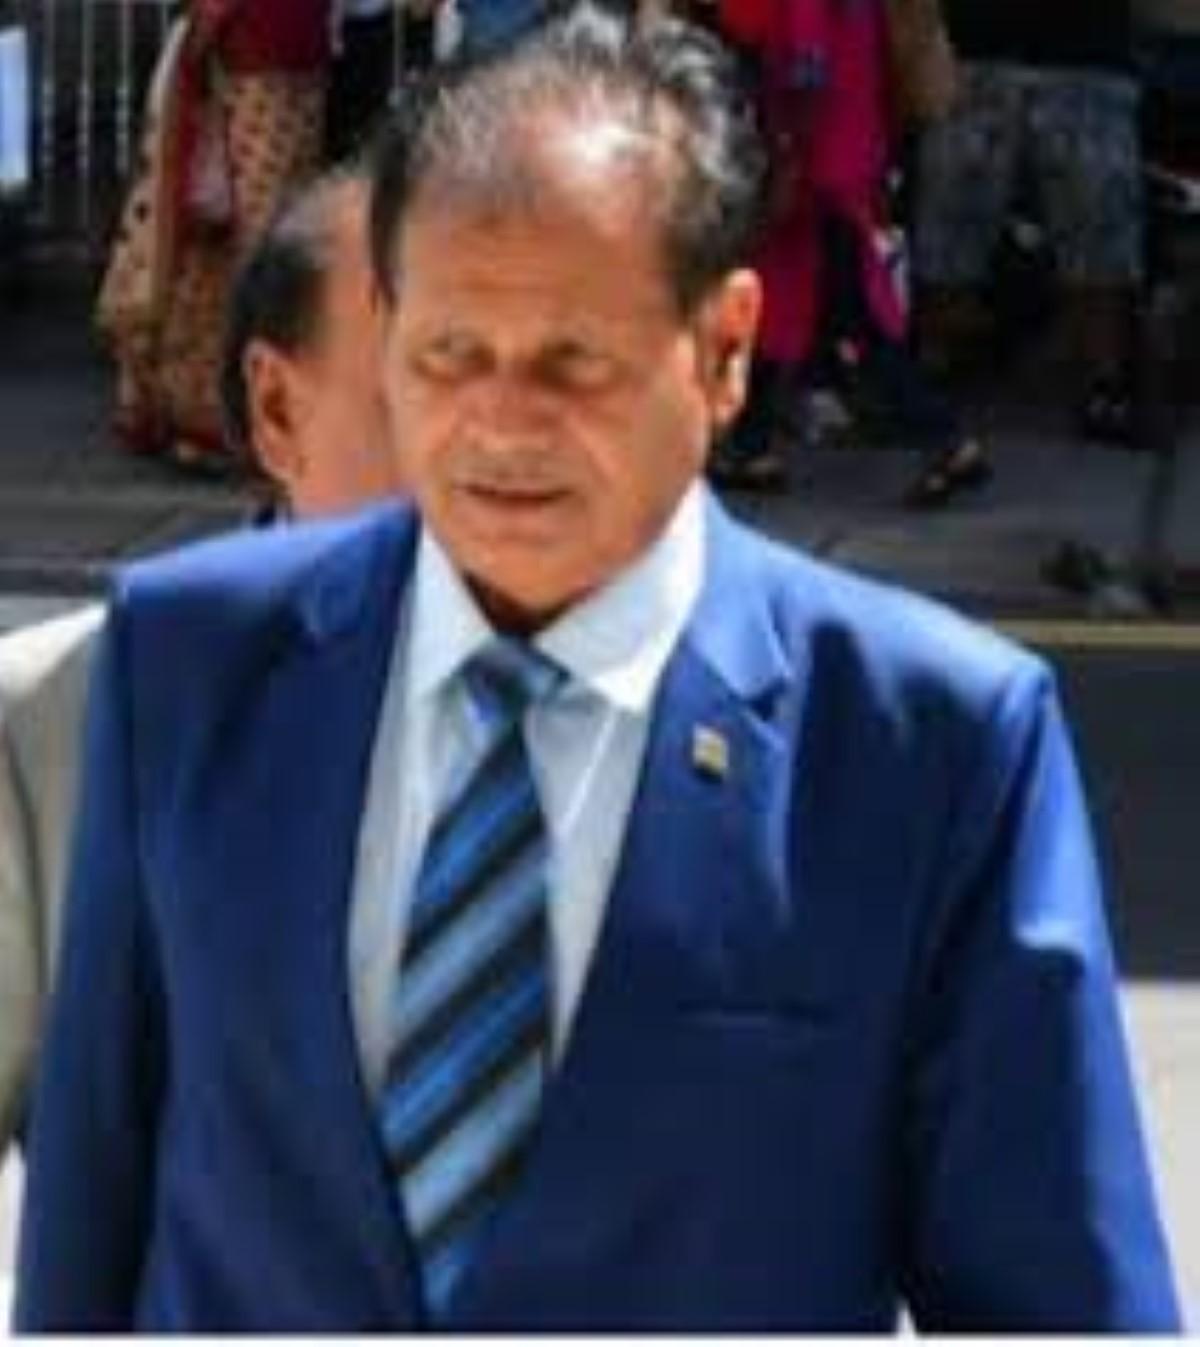 Enter Yaasin Pohrun dans l'affaire Bal Kouler